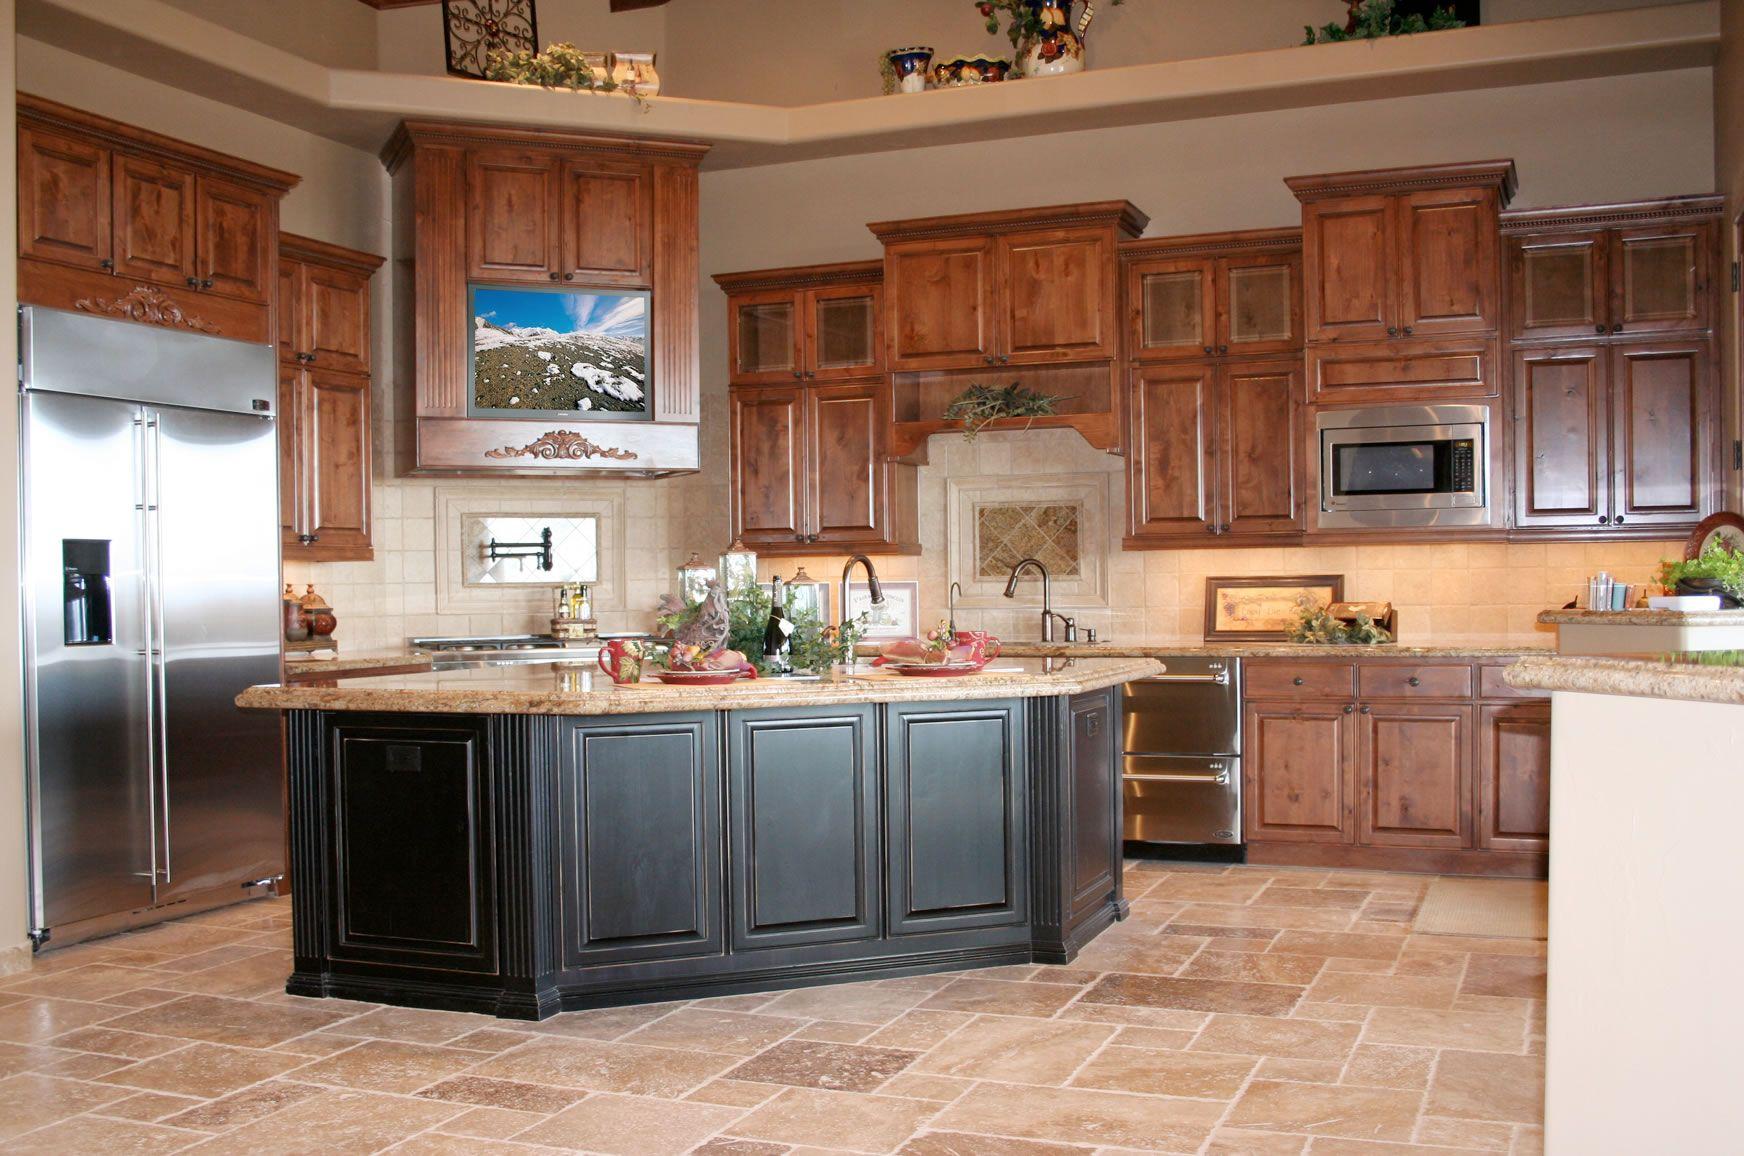 top 25 ideas about luxury kitchen design on pinterest home luxury kitchen design and oak kitchen cabinets